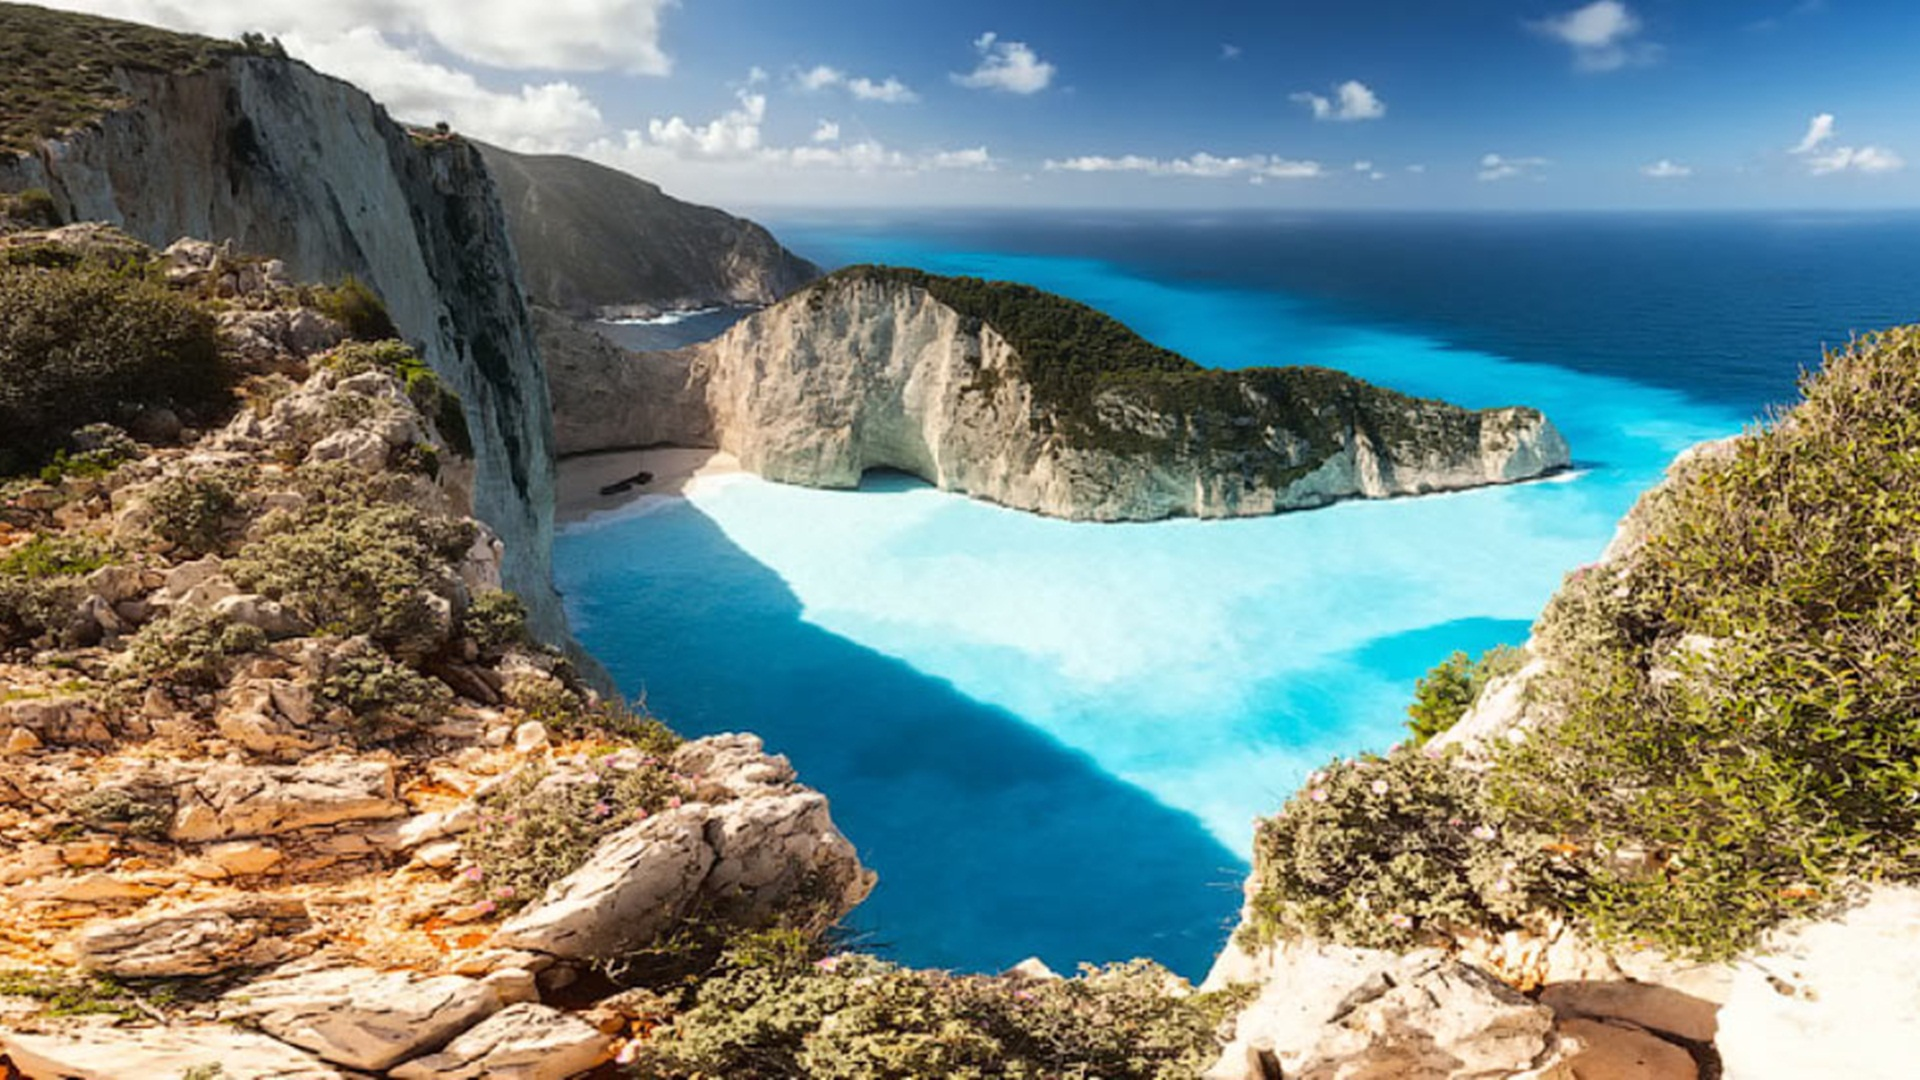 Blue Caves Zakynthos Island Greece Best Wallpaper 27151   Baltana 1920x1080